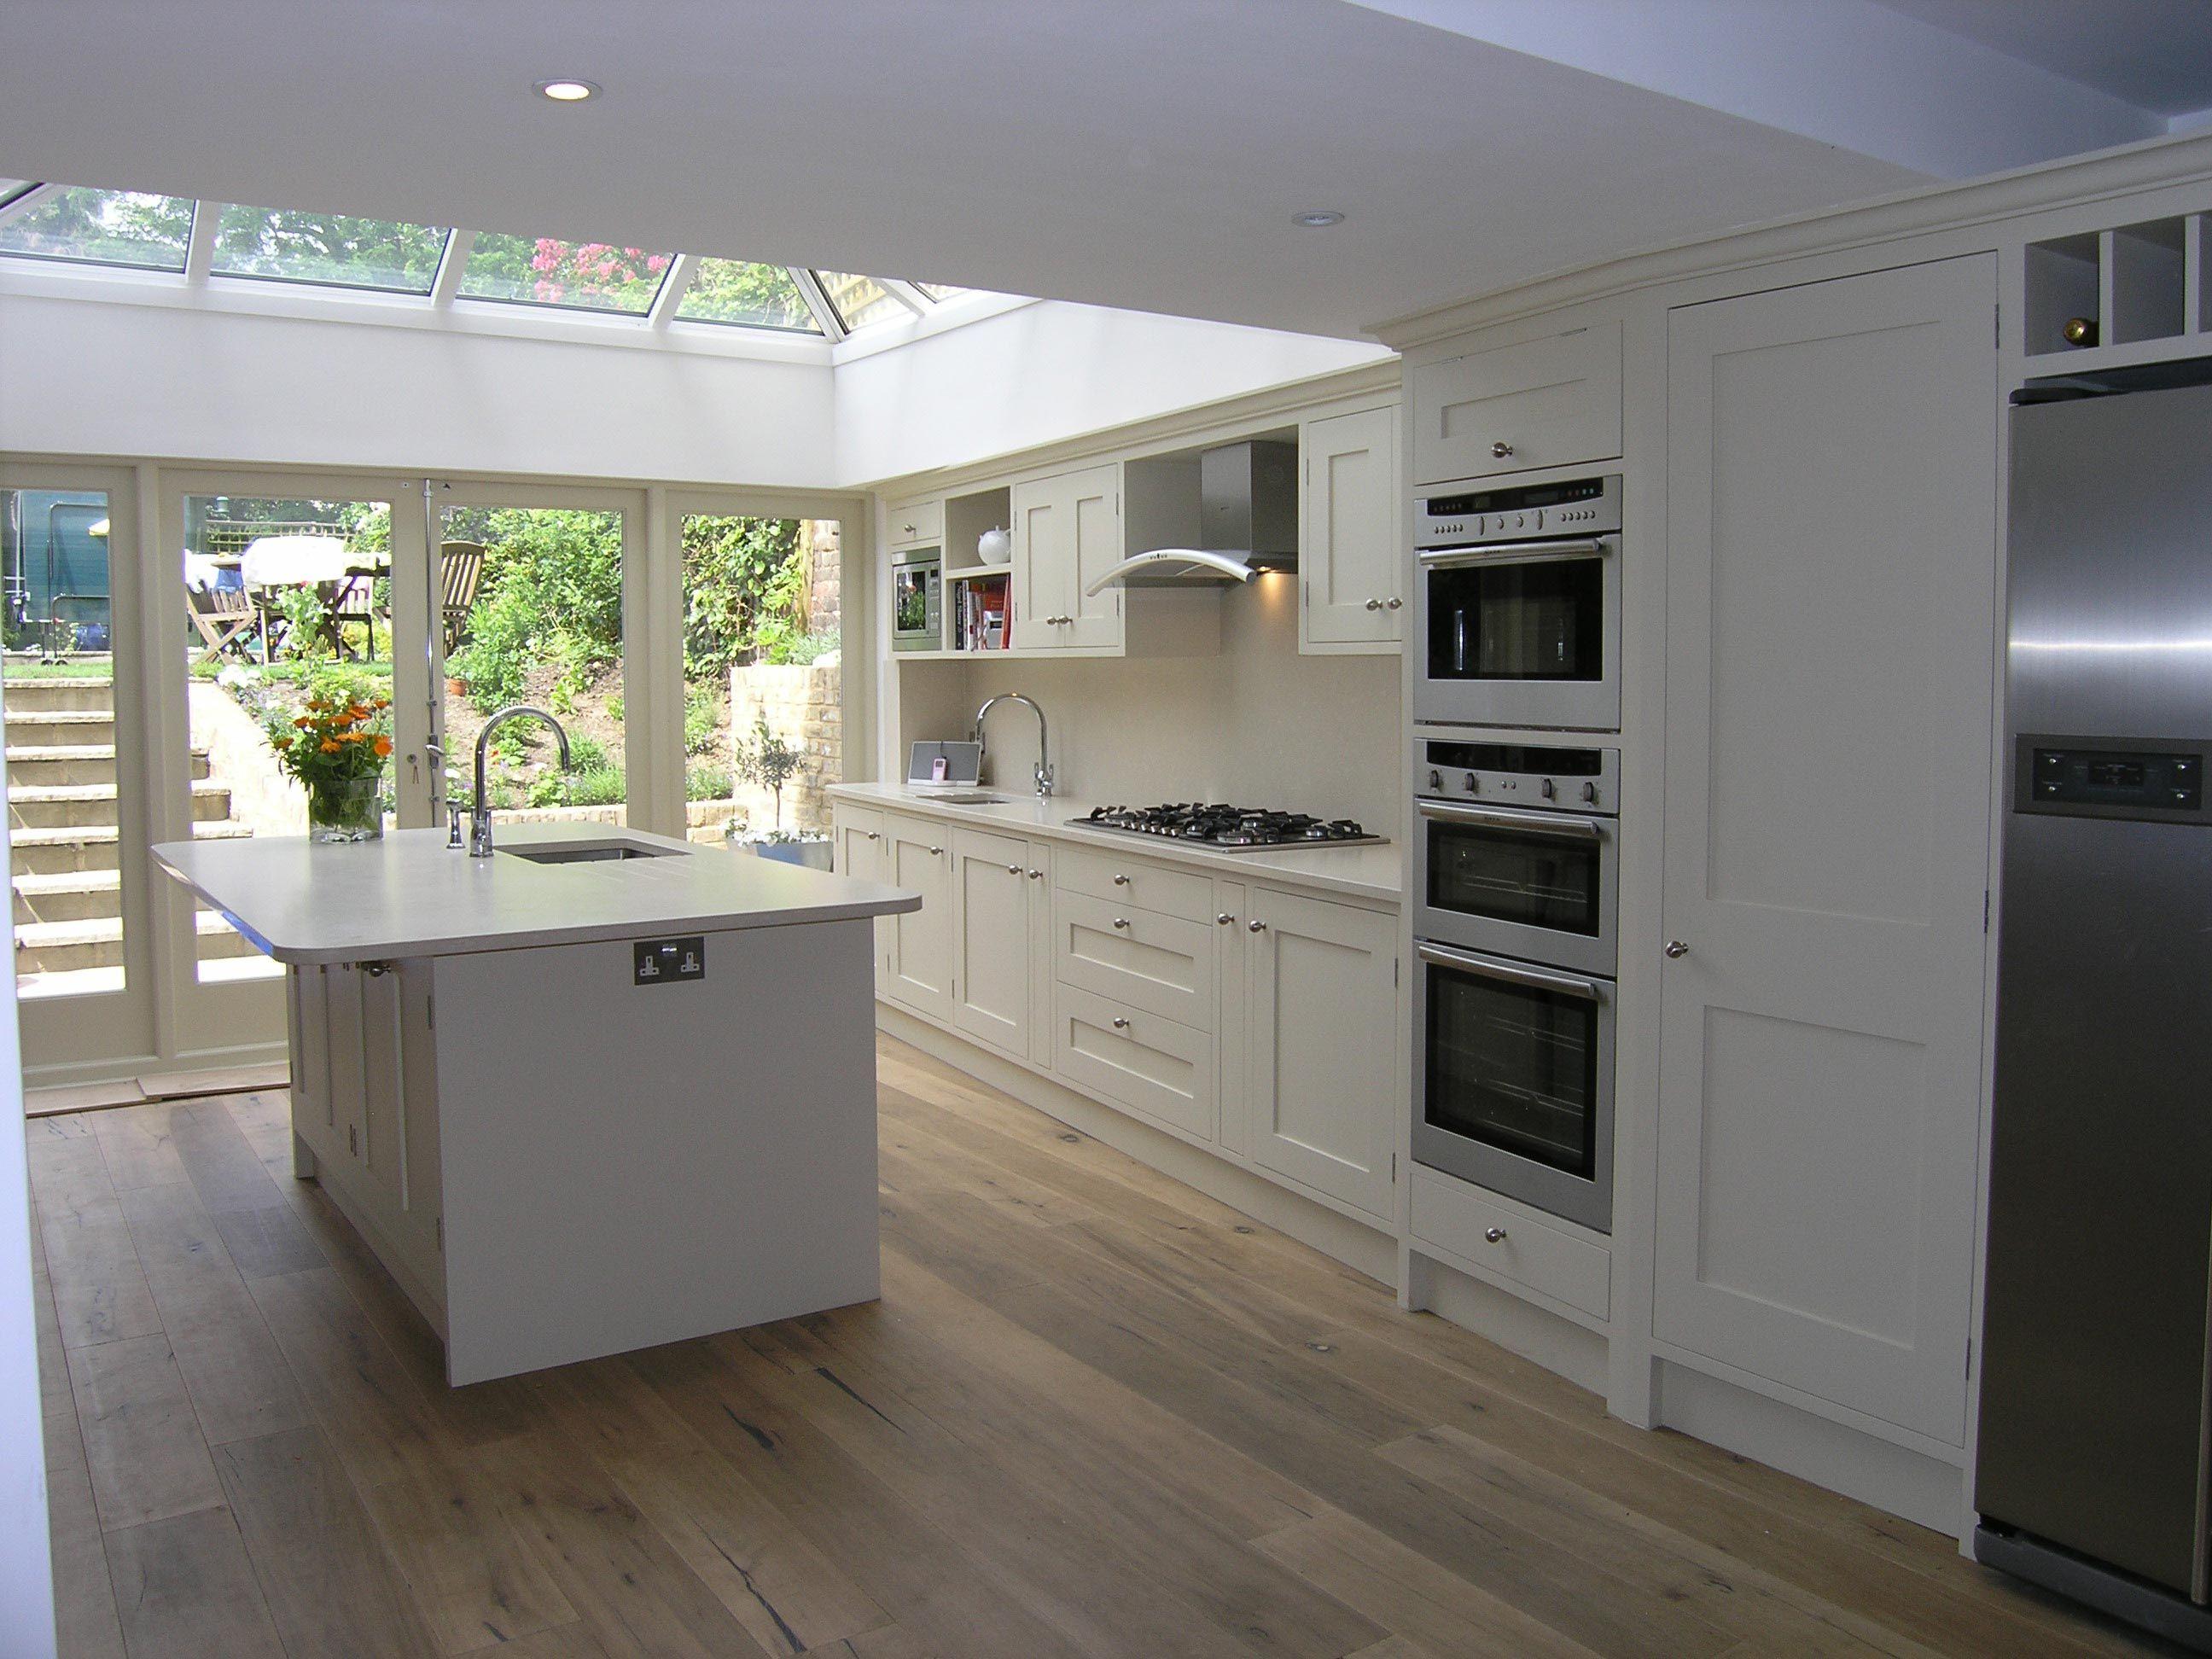 London Shaker Kitchens Design And Installation Clapham South West New Kitchen Design And Installation Design Decoration